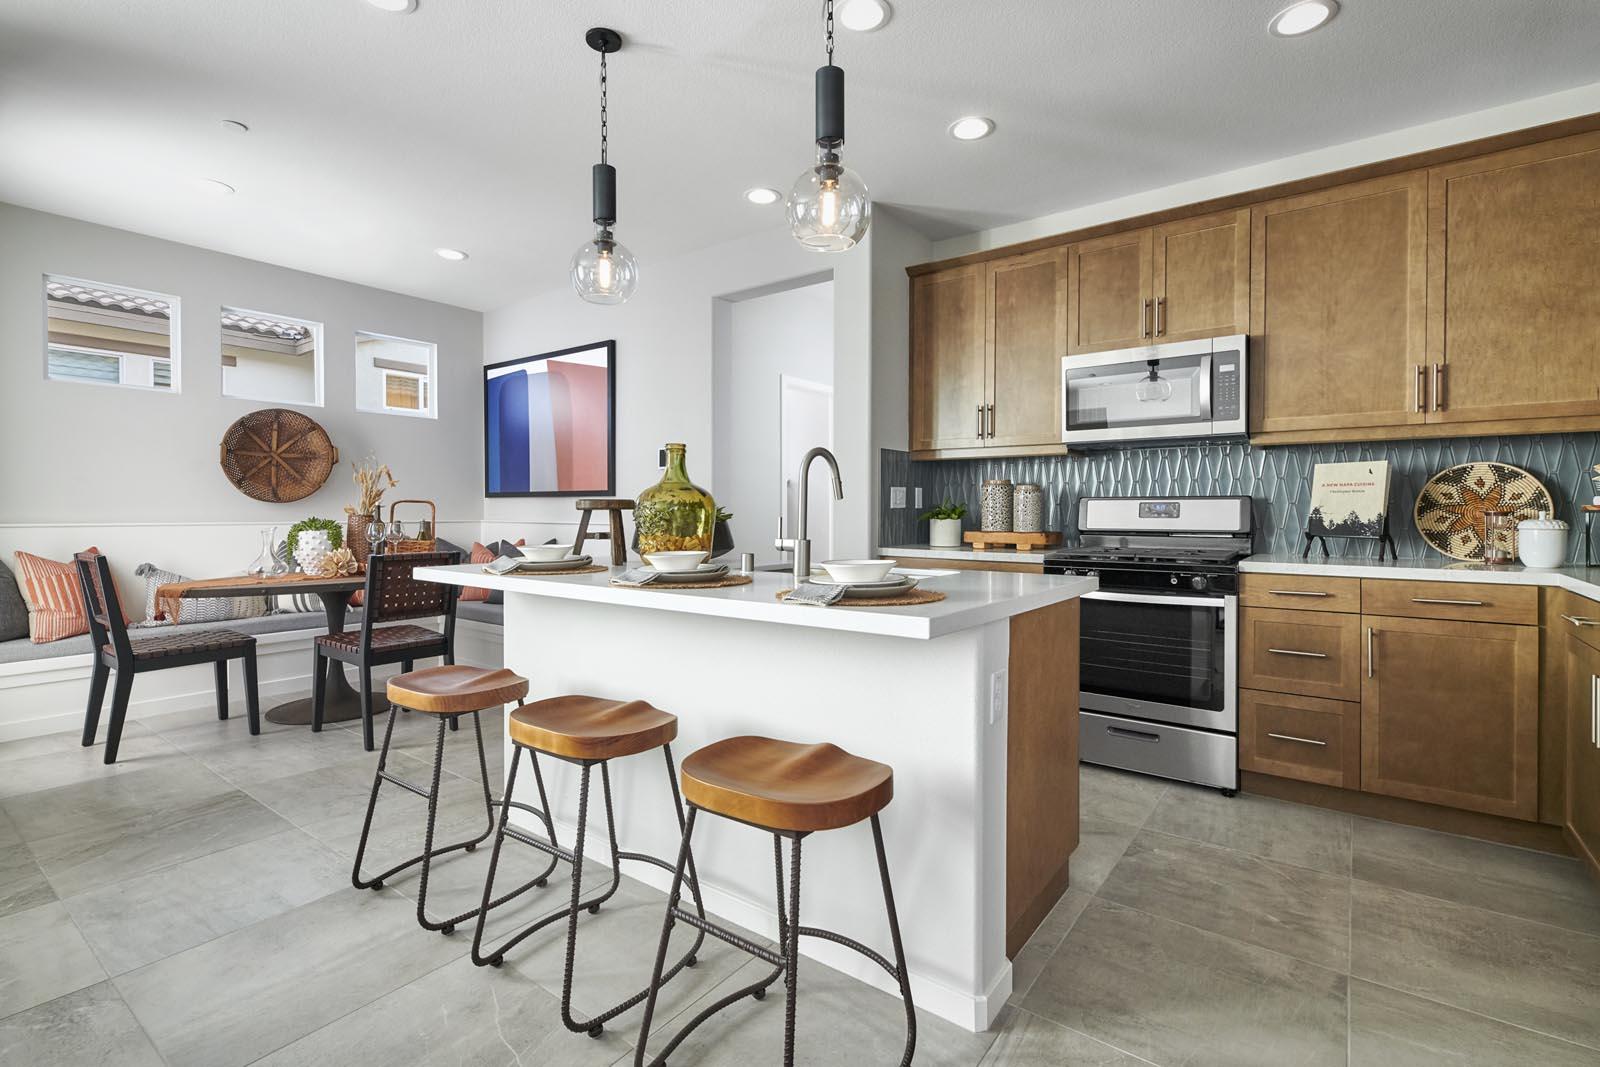 Kitchen   Residence 1   Lumin   New Homes in Rancho Cucamonga, CA   Van Daele Homes